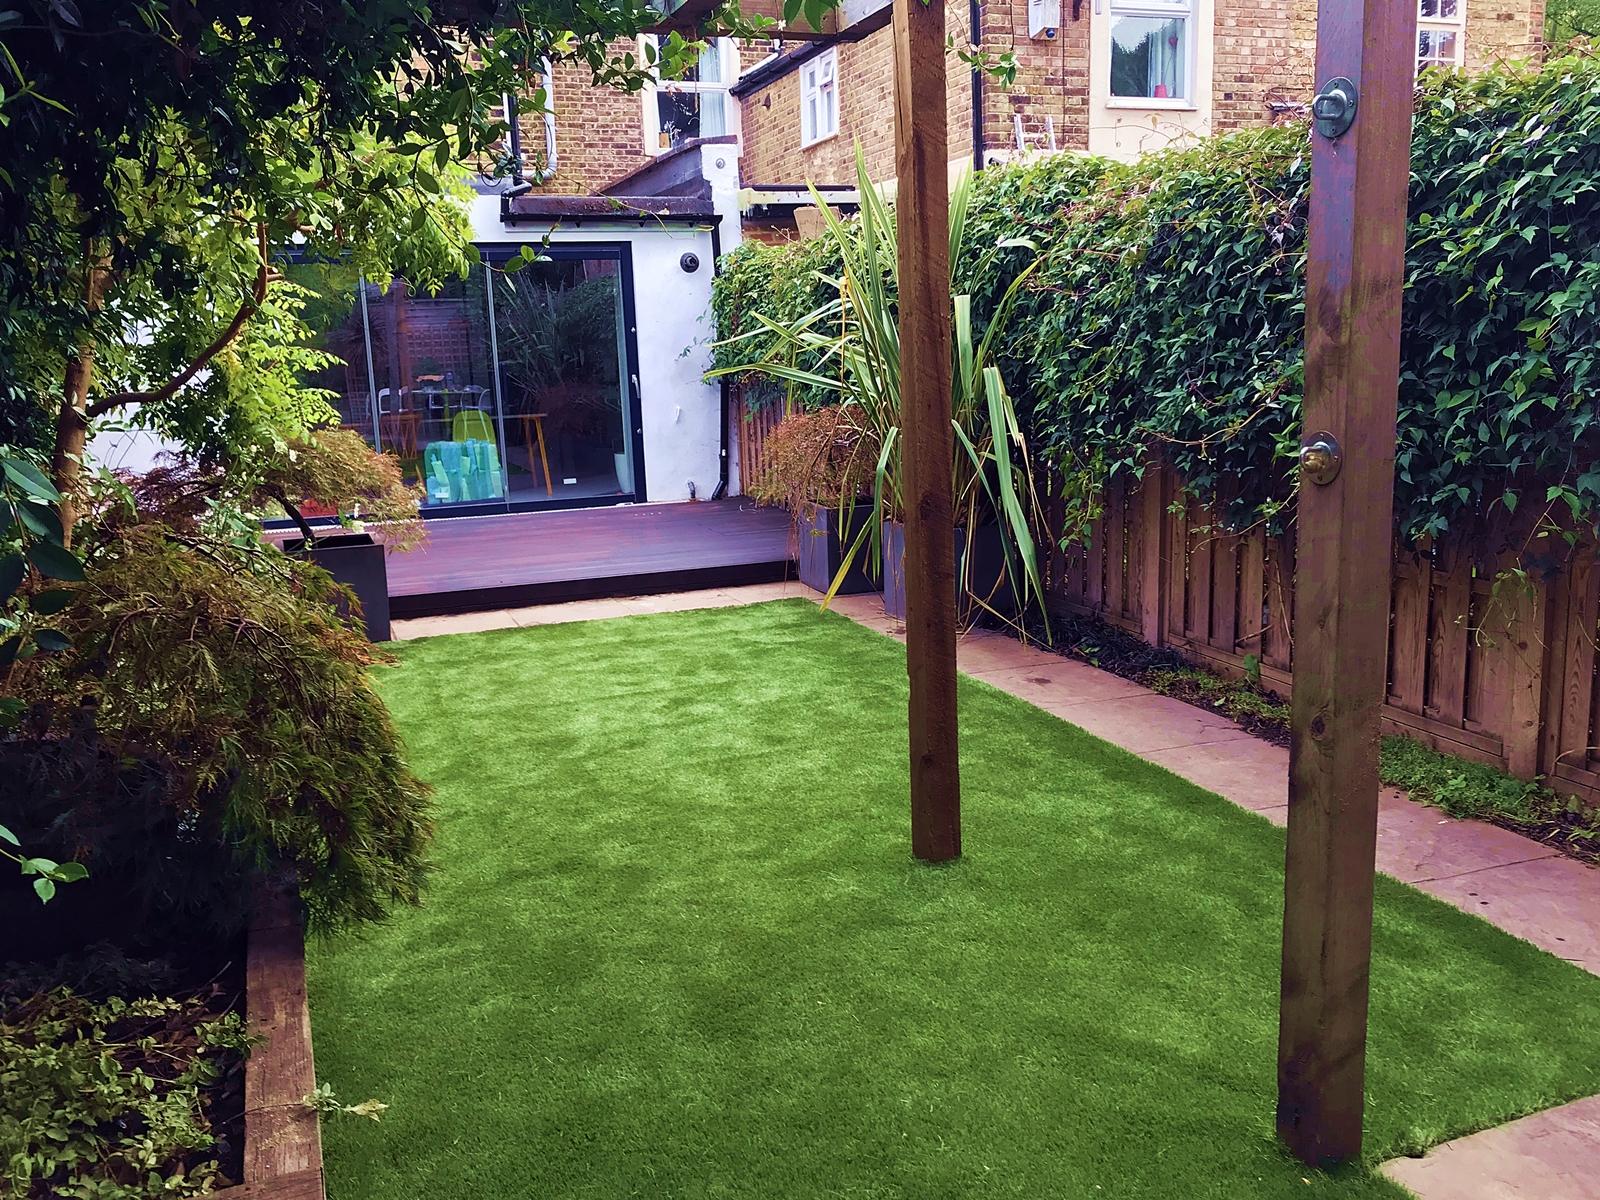 Astro Turf Garden >> Sunken Garden Trampoline With Walk on Lid Cover - London Garden Blog